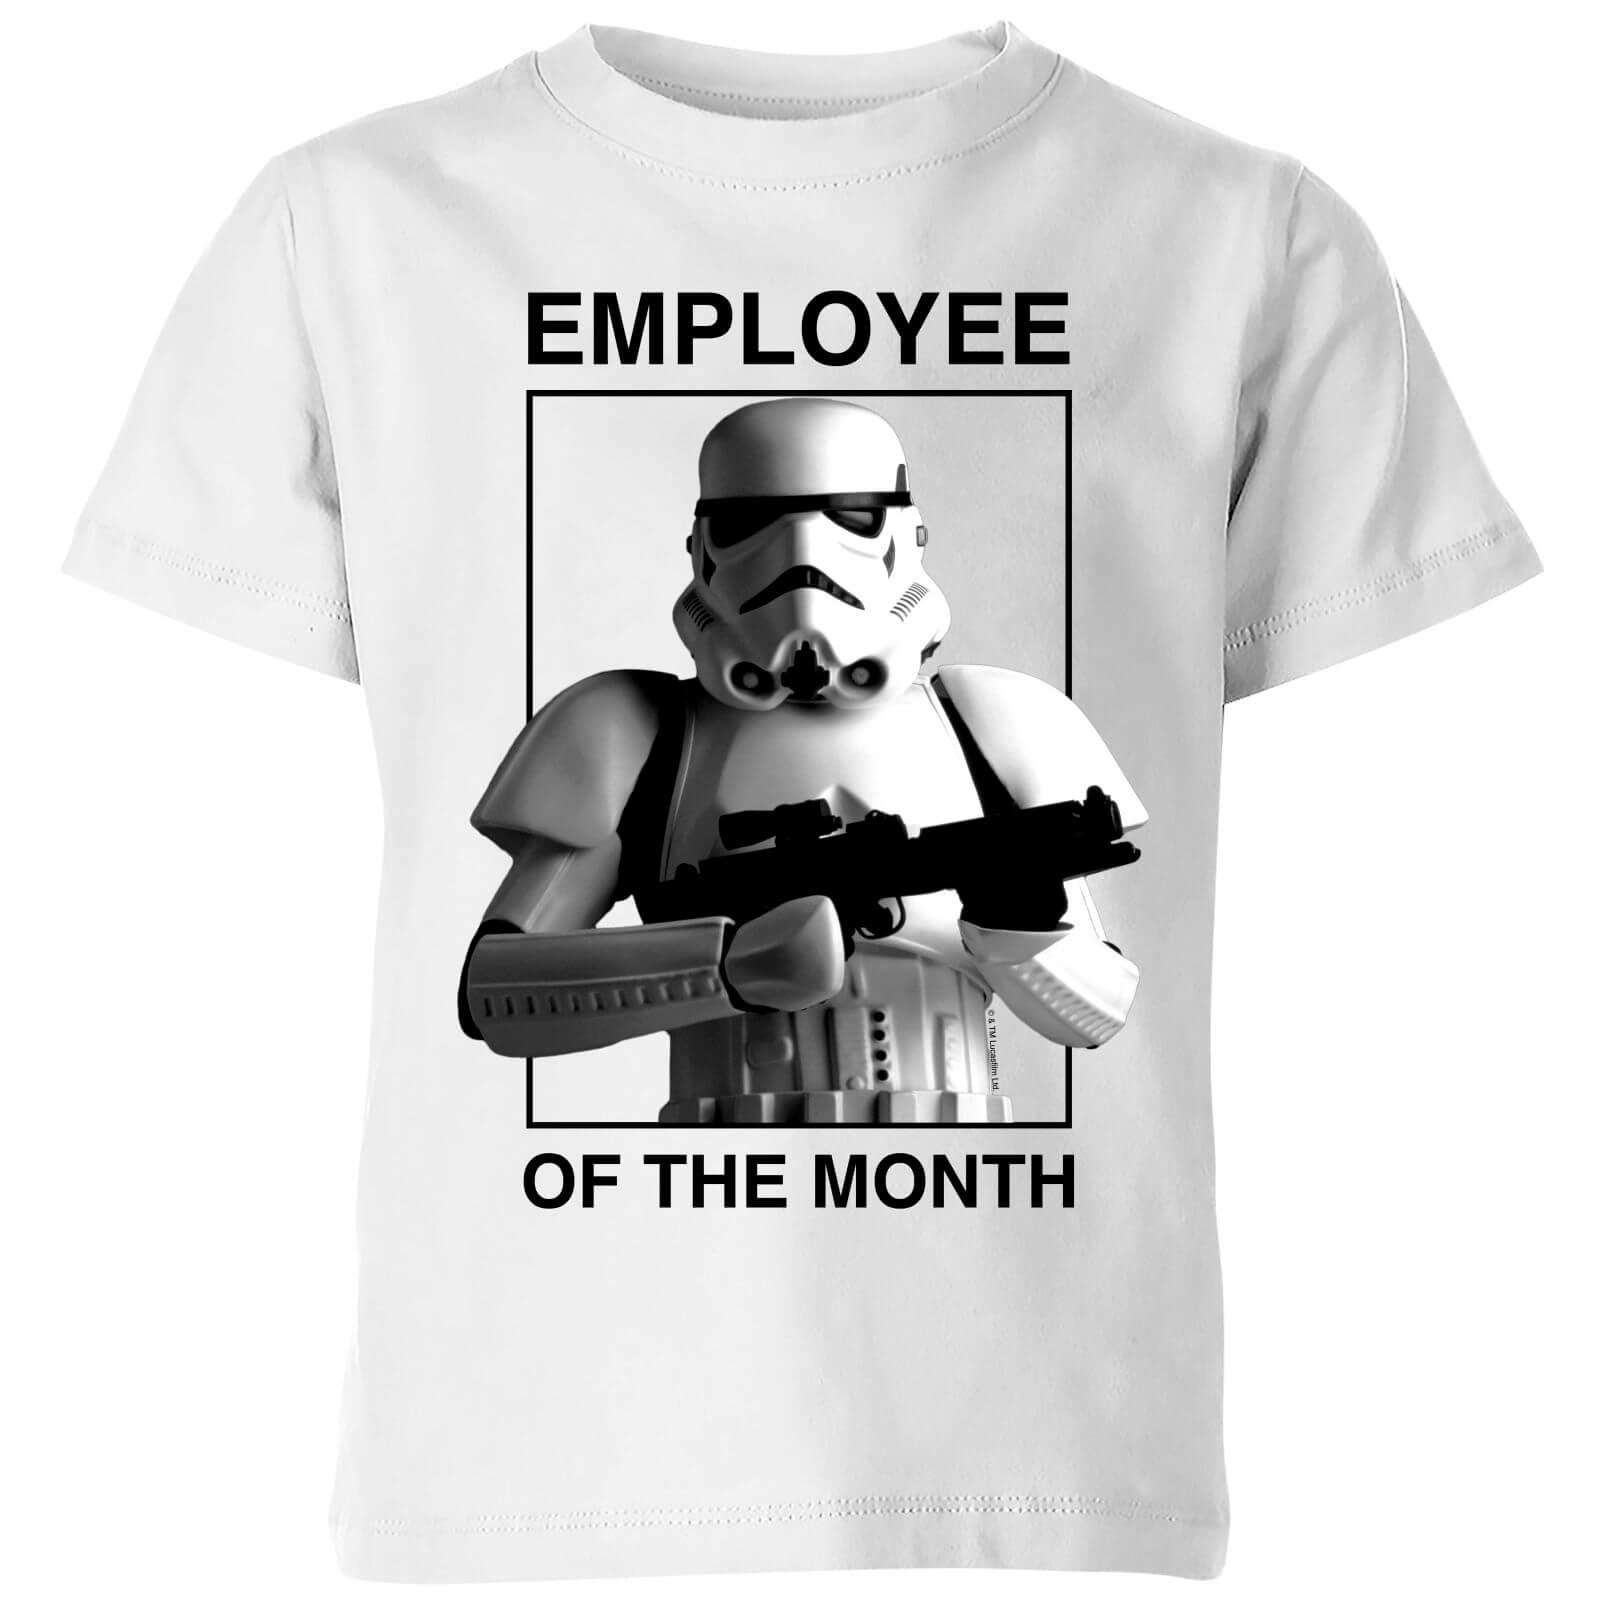 Star Wars T-Shirt Enfant Employé du Mois Star Wars Classic - Blanc - 7-8 ans - Blanc